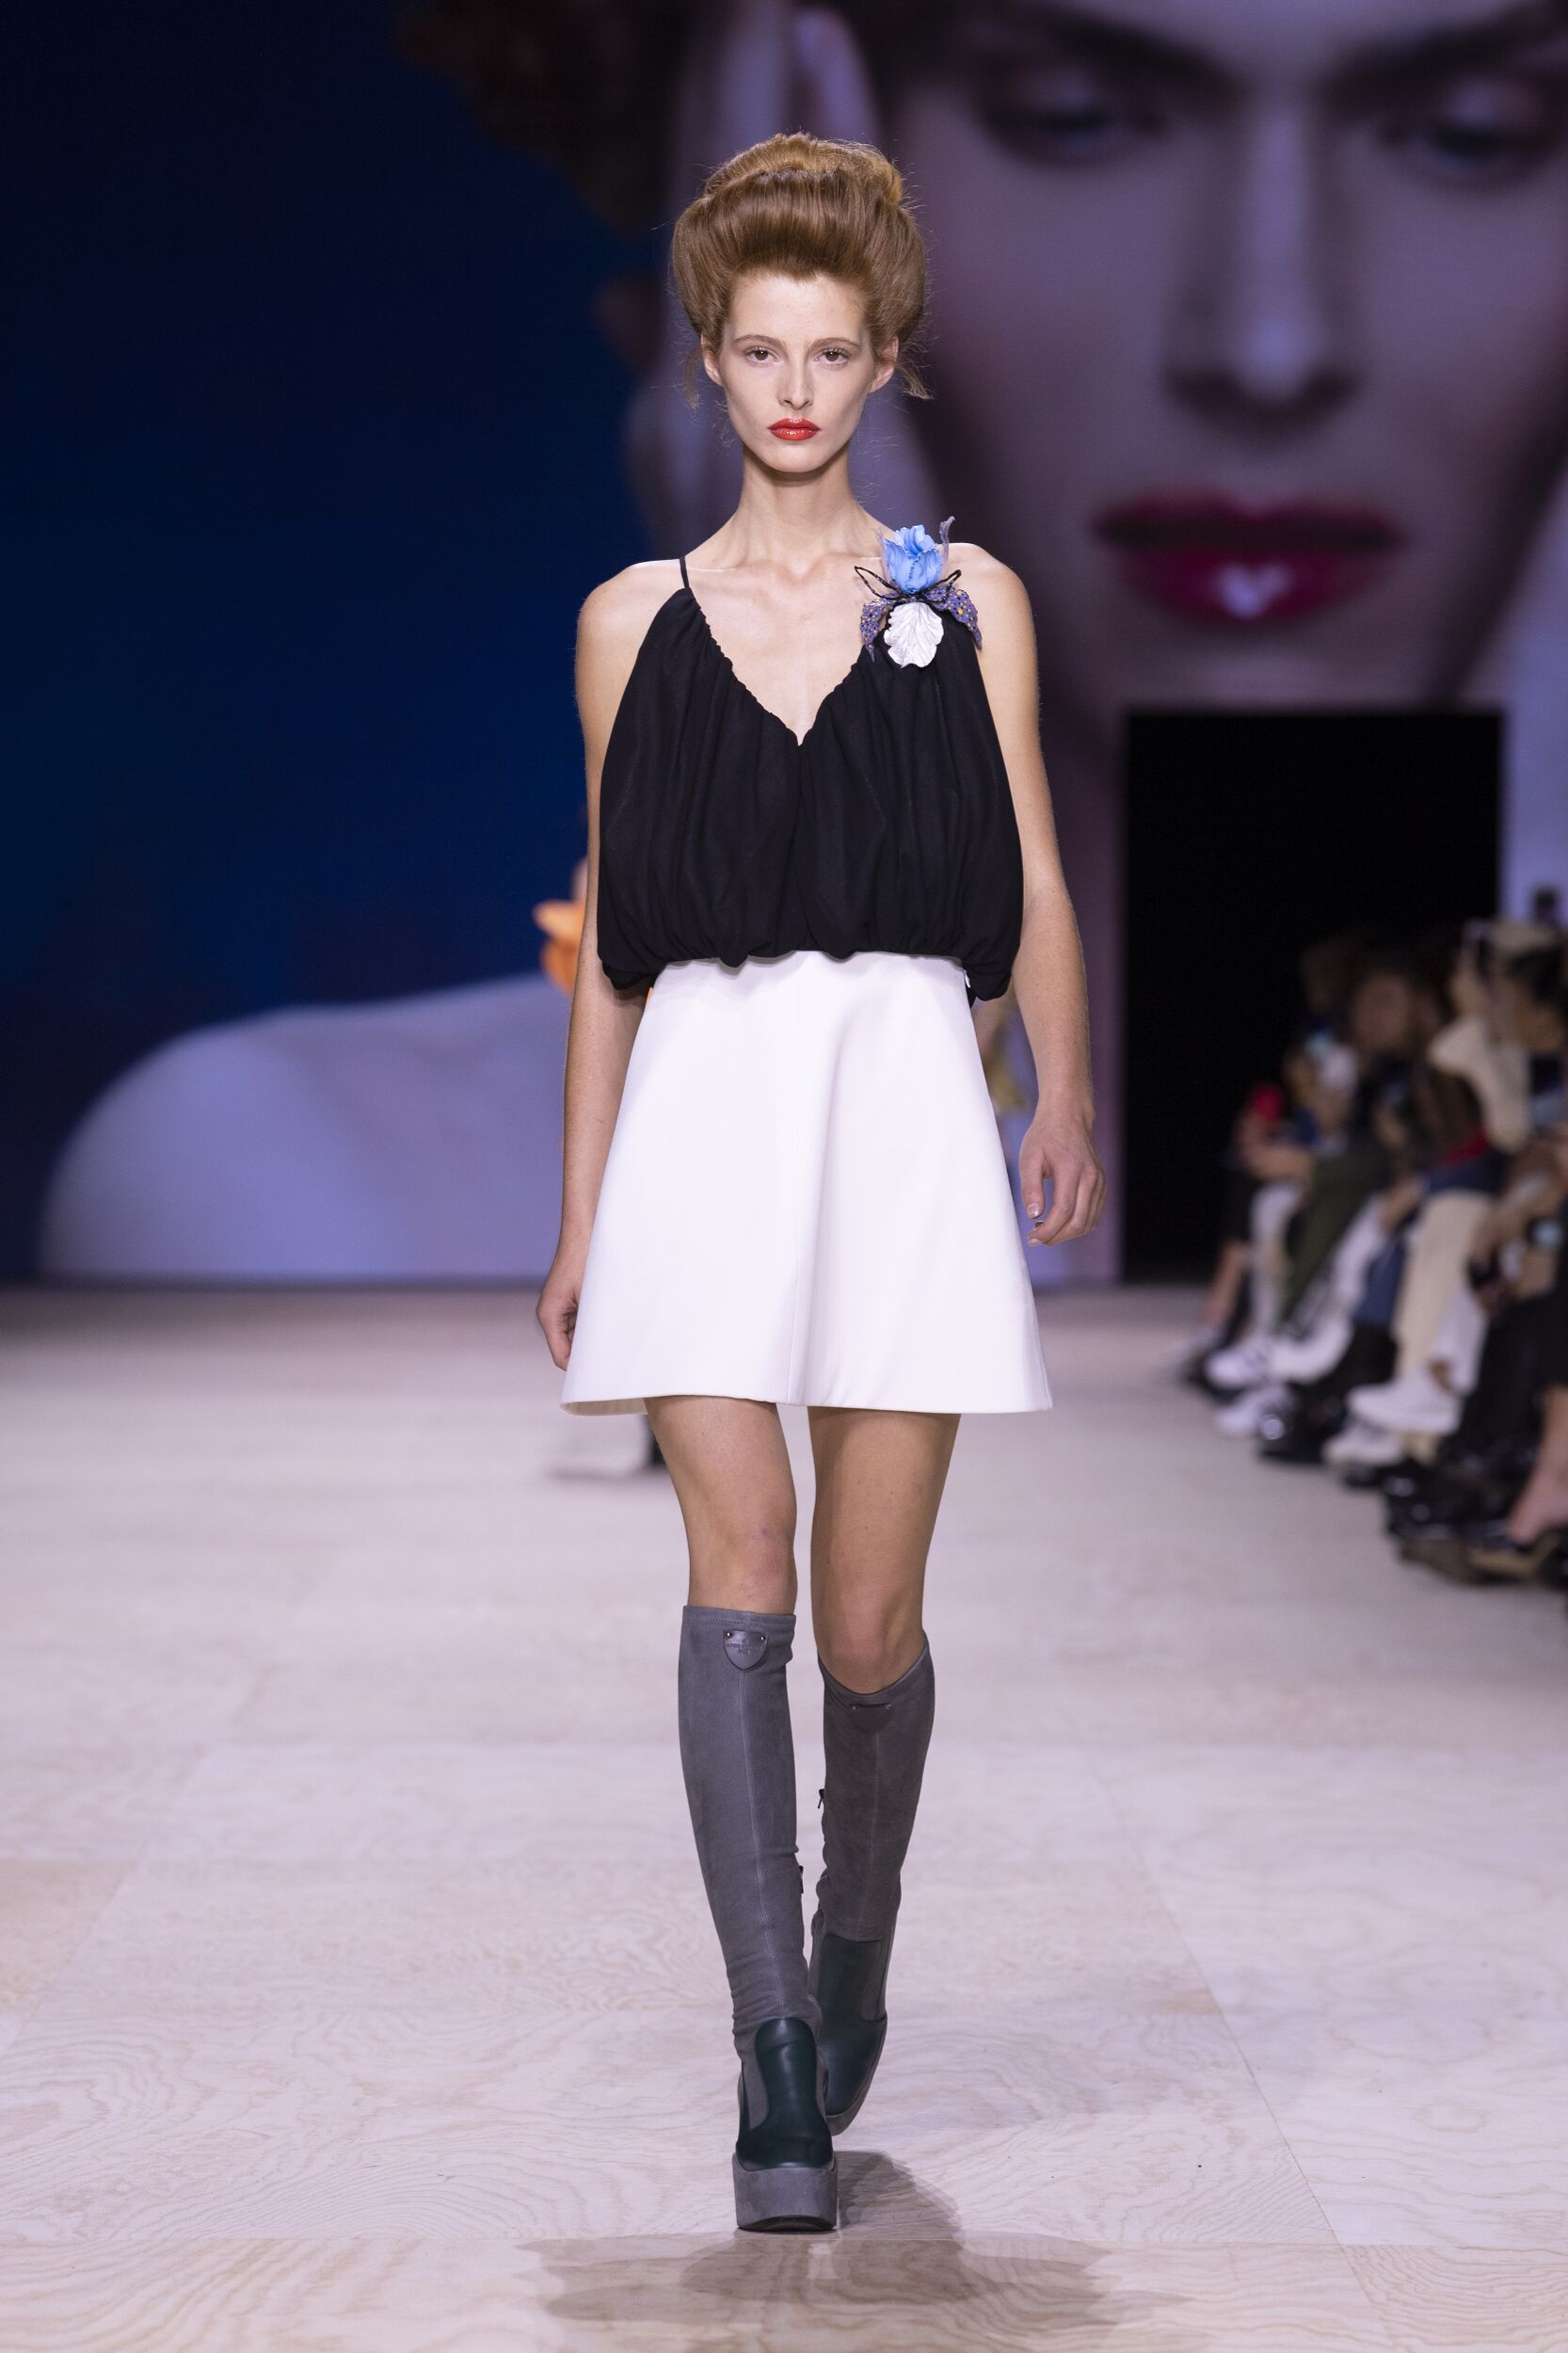 2020 Catwalk Louis Vuitton Fashion Show Summer